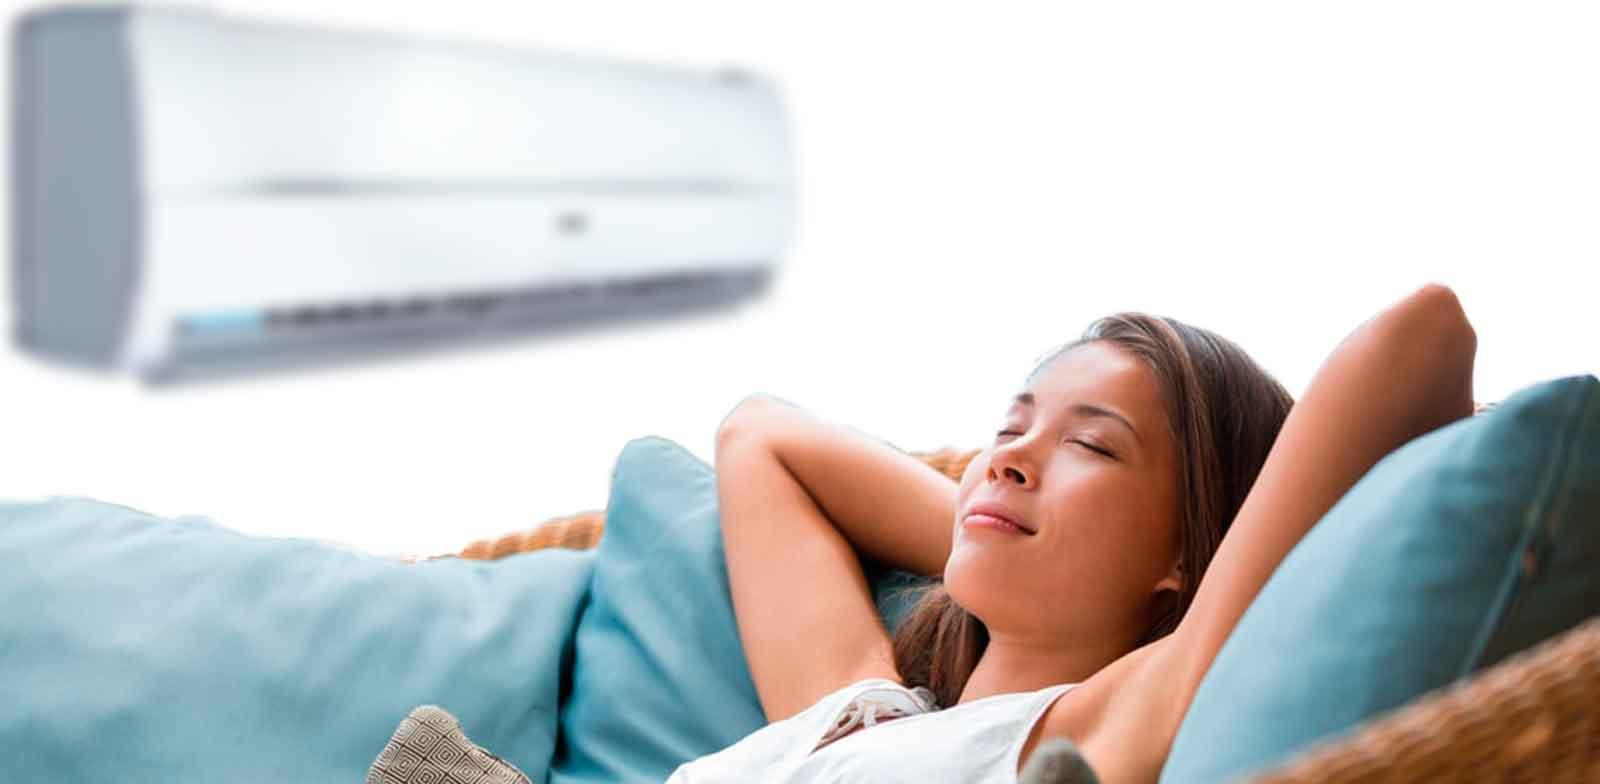 Climart aire aondicionado